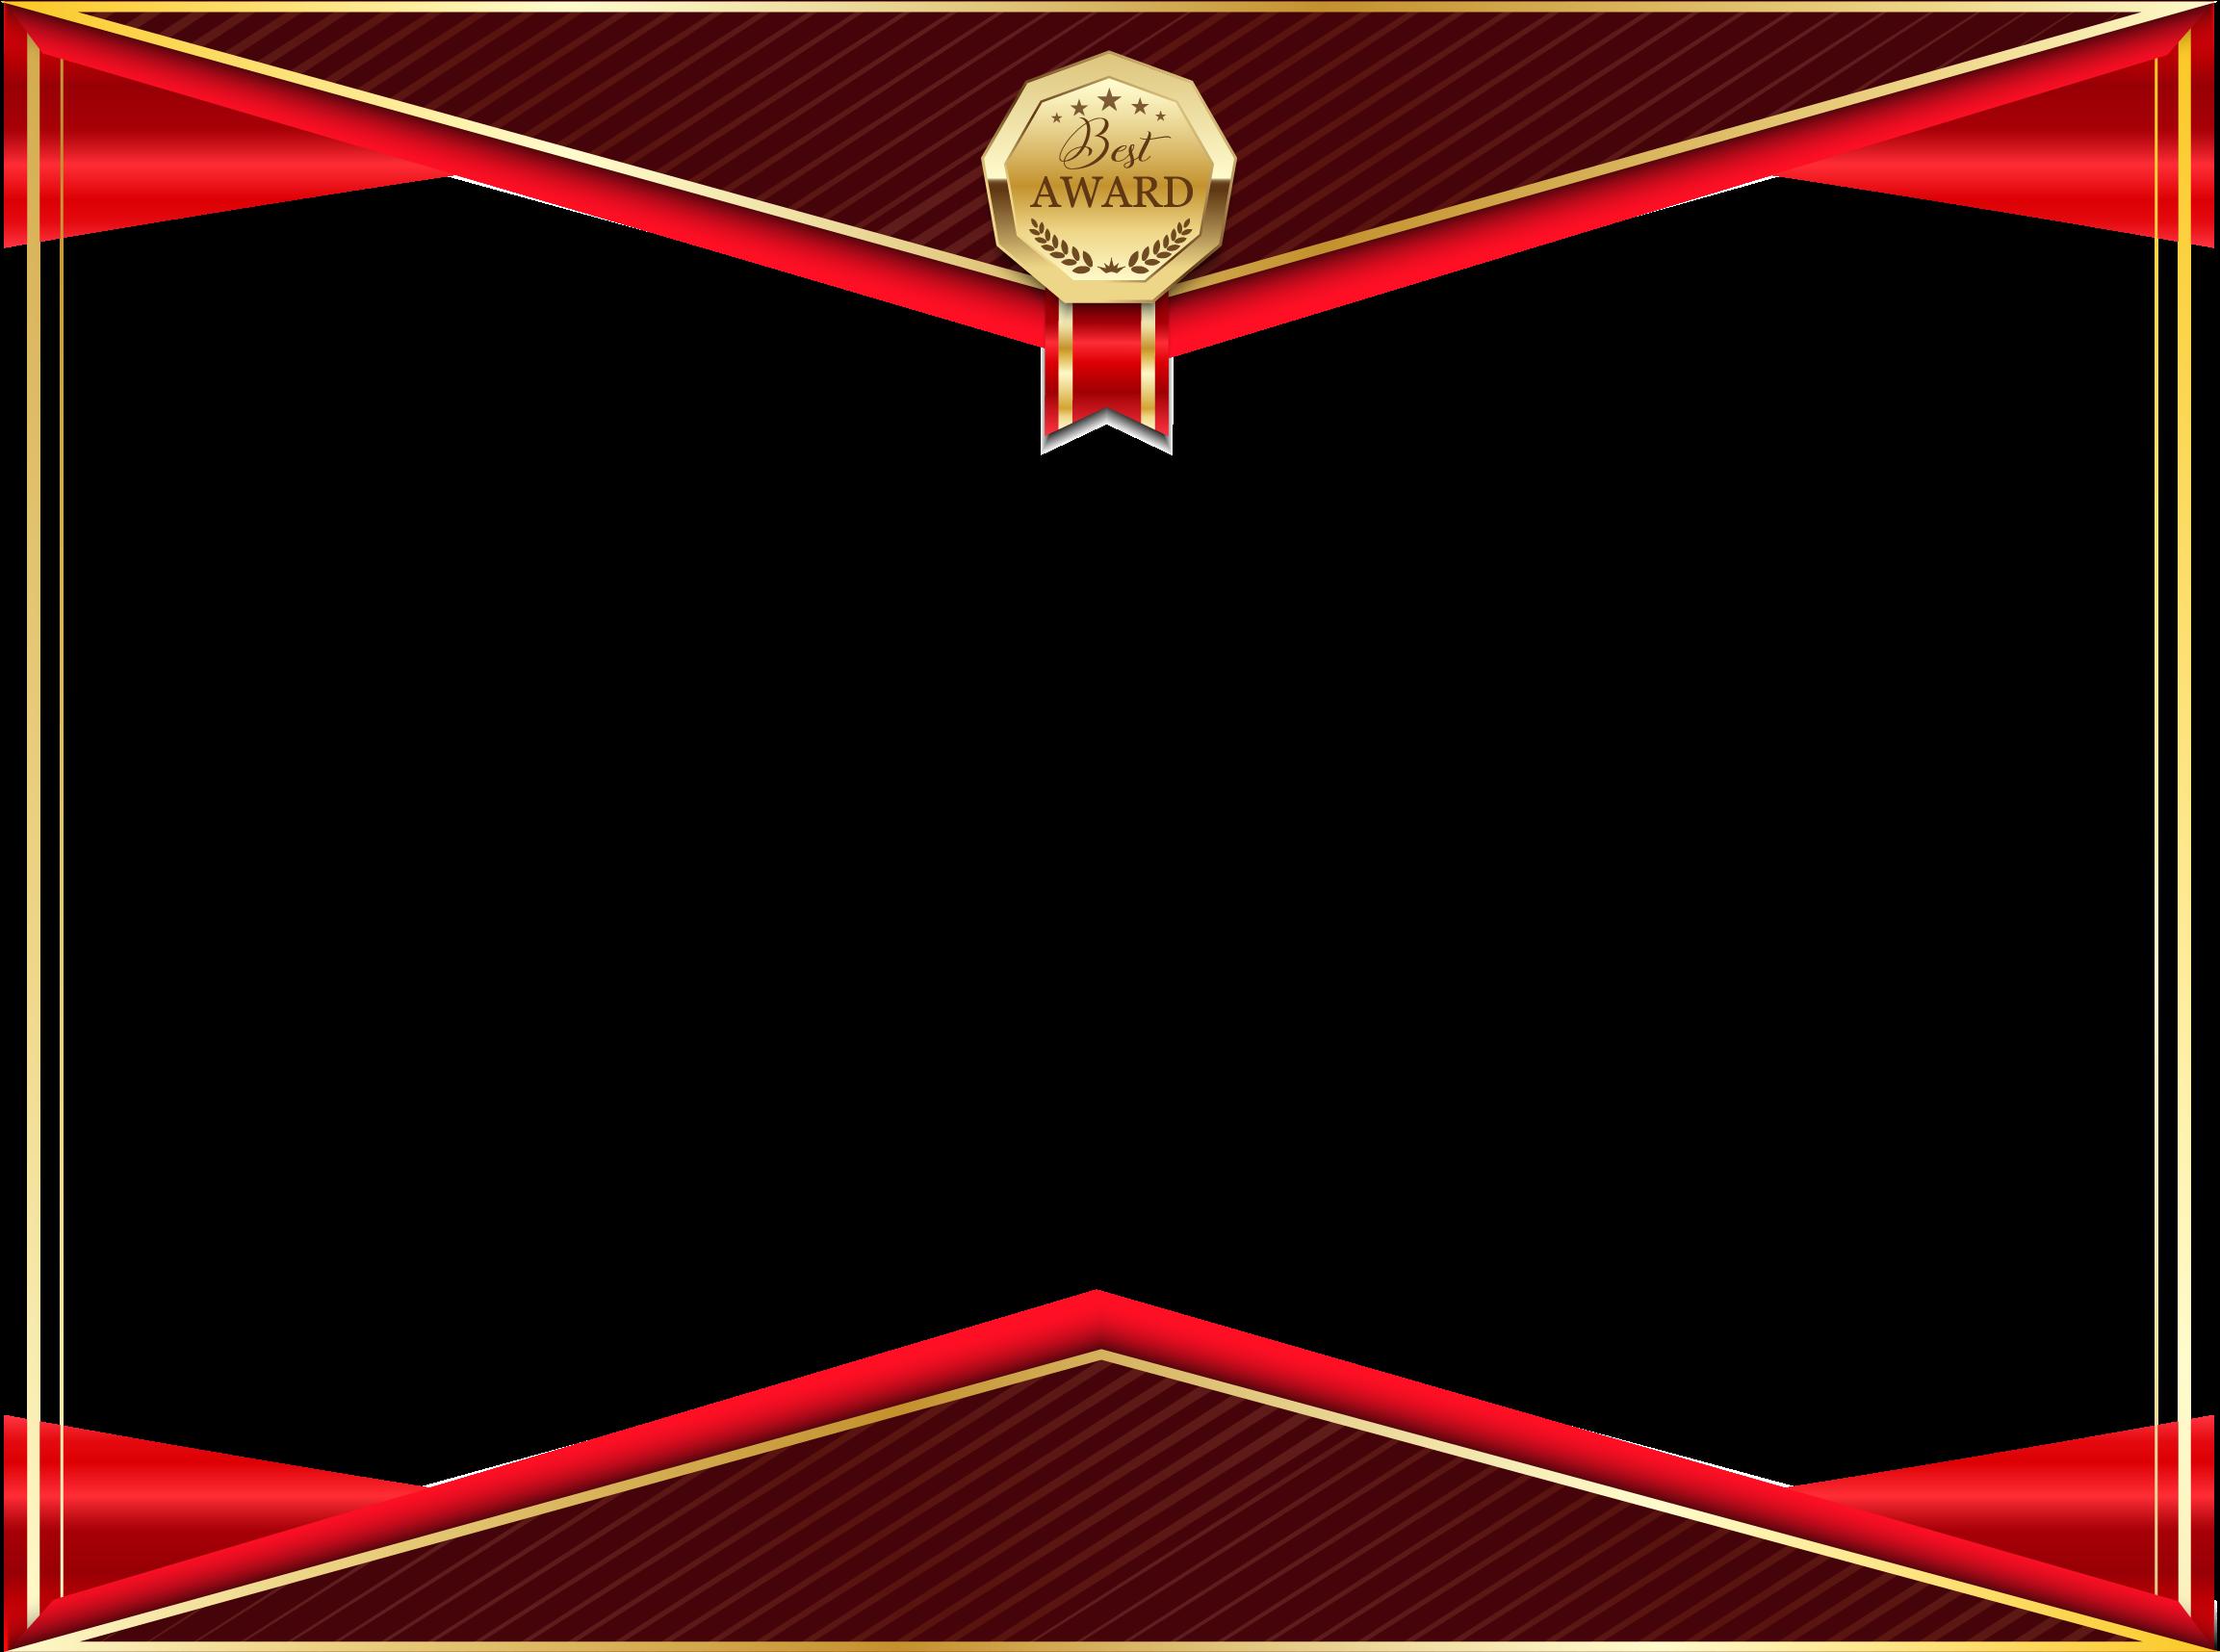 Certificate Png Transparent Image.